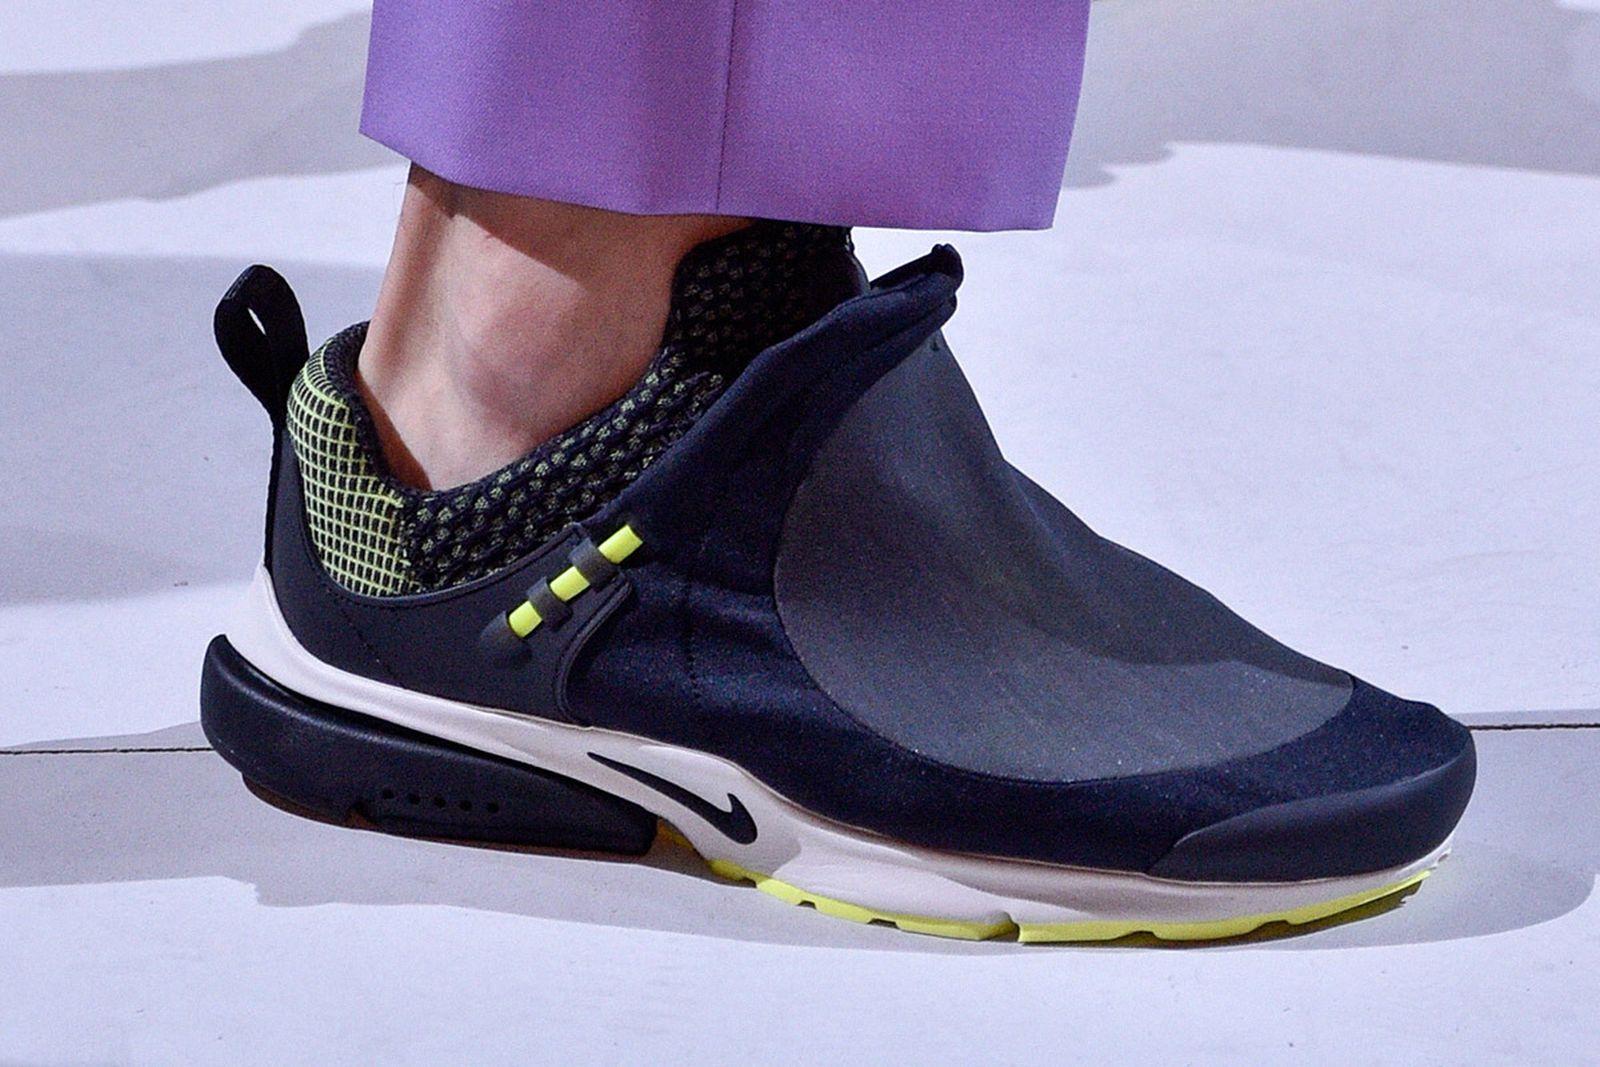 Alegaciones Cromático hueco  The Nike Air Presto Foot Tent Was Tinker Hatfield's Biggest Flop